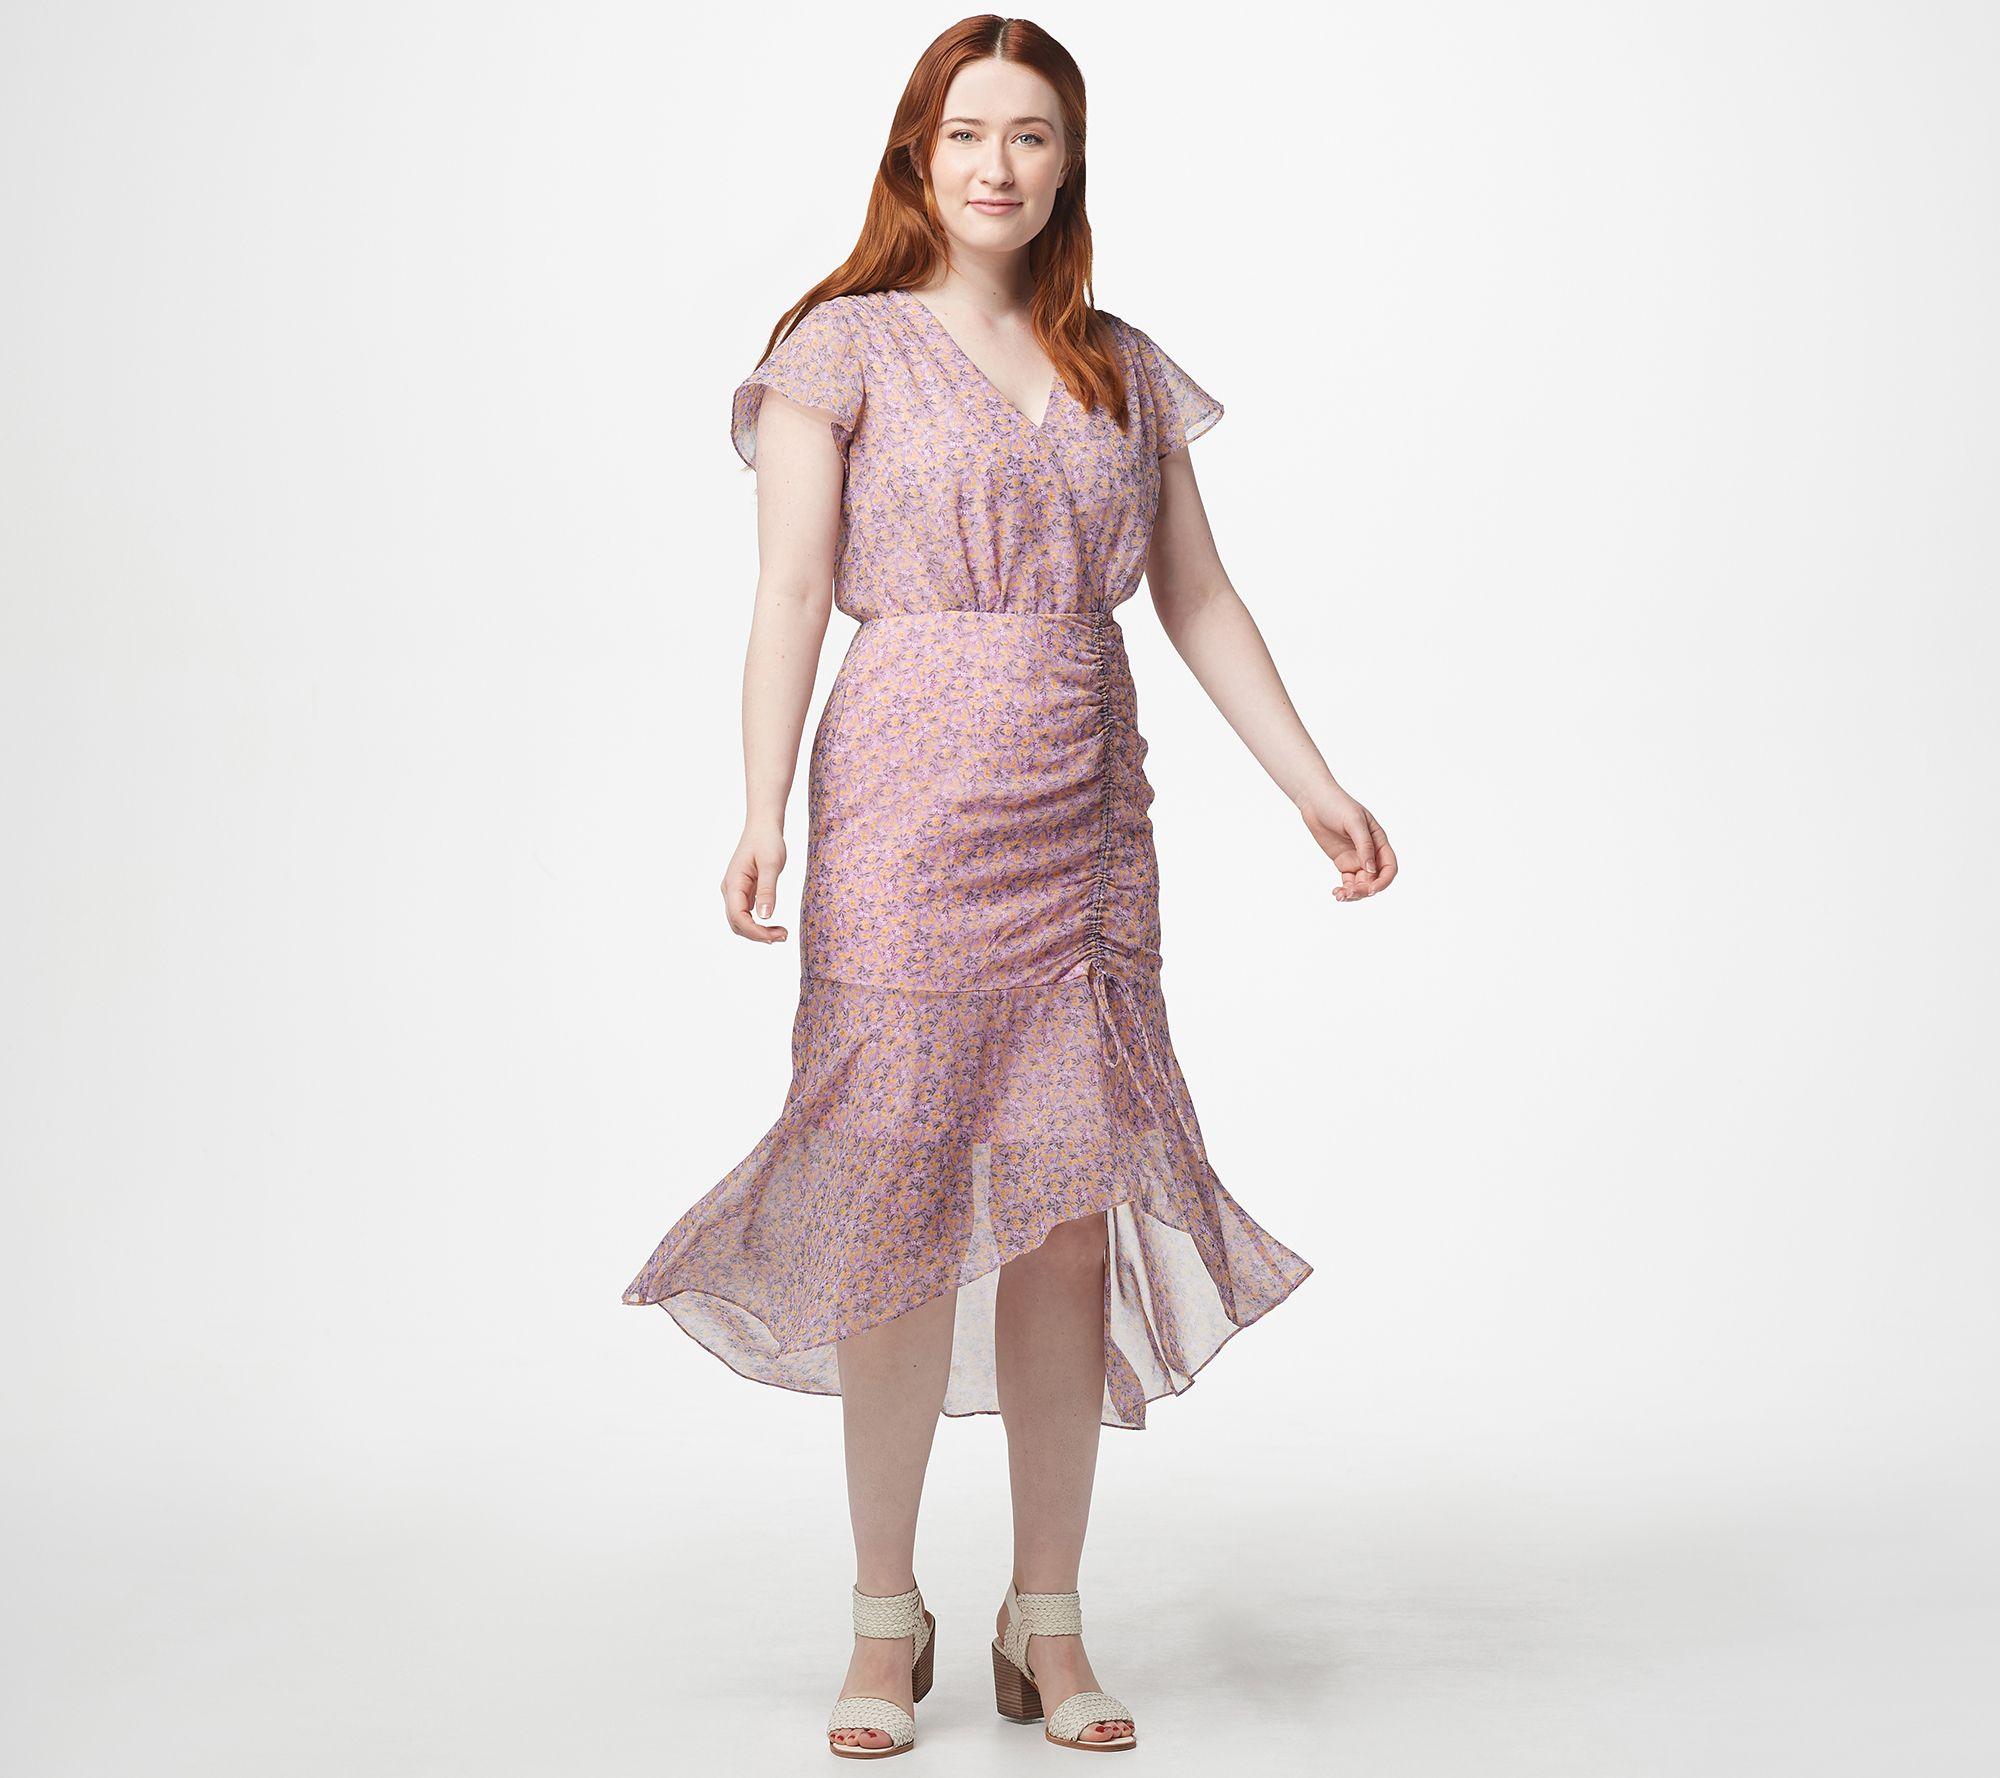 61d69224eba8 Sam Edelman Printed Ruched Midi Dress - Page 1 — QVC.com